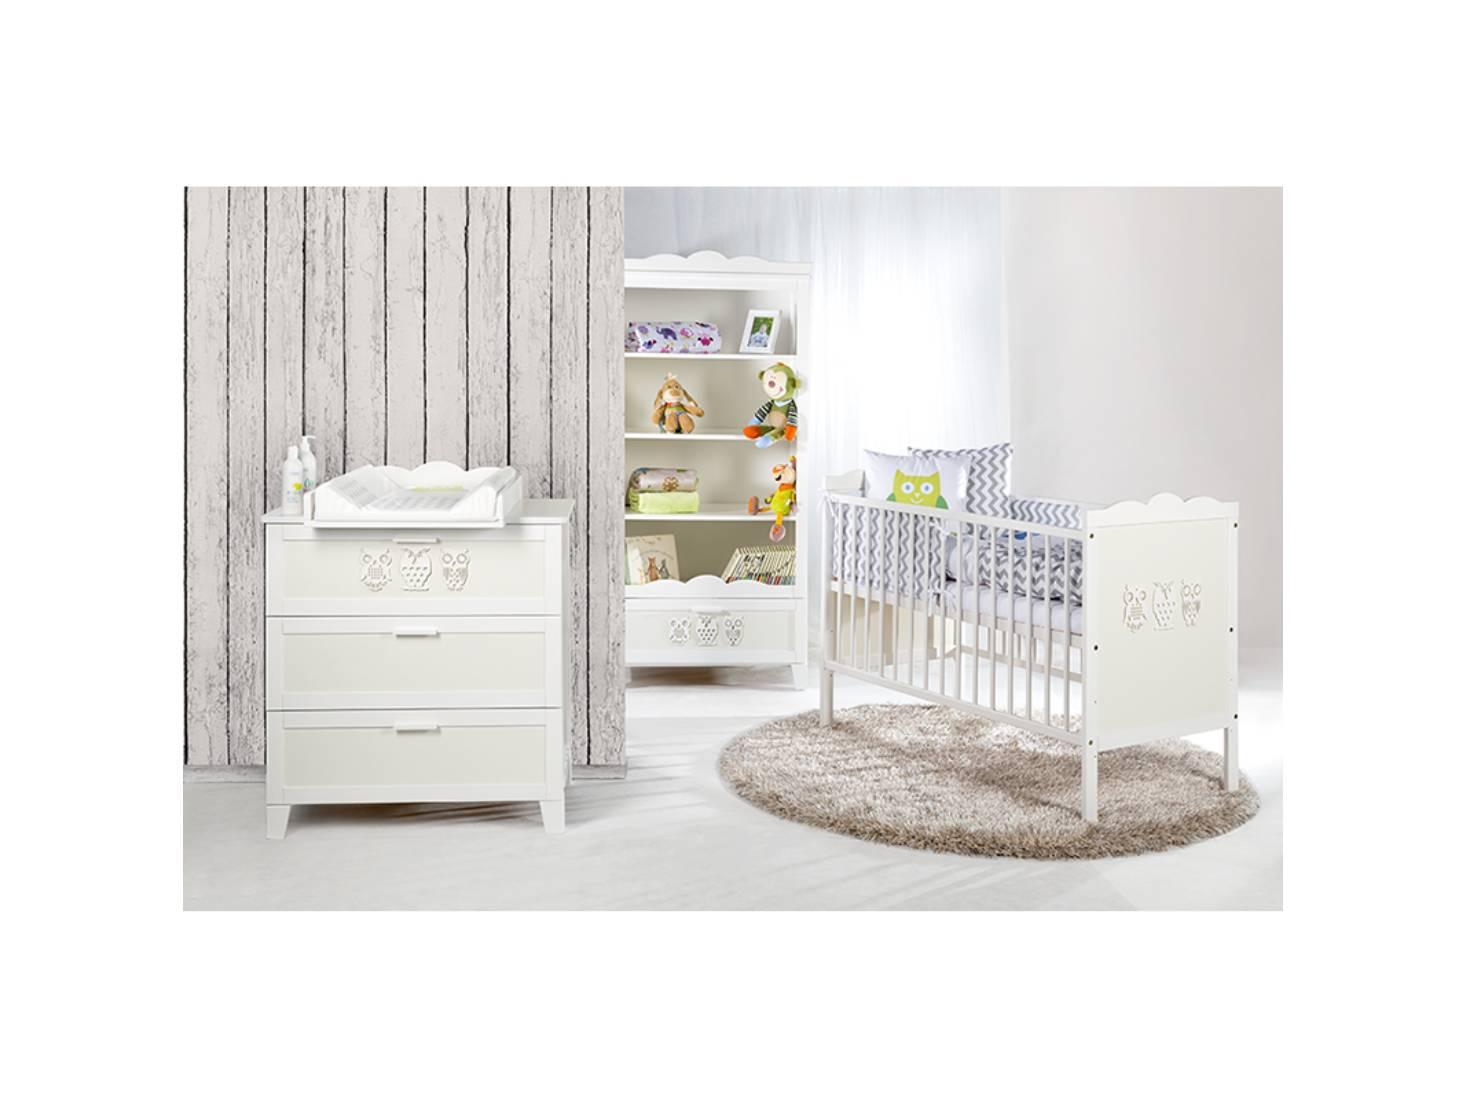 Mobilier camera copii si bebelusi Klups Marsell, Bufnite 2